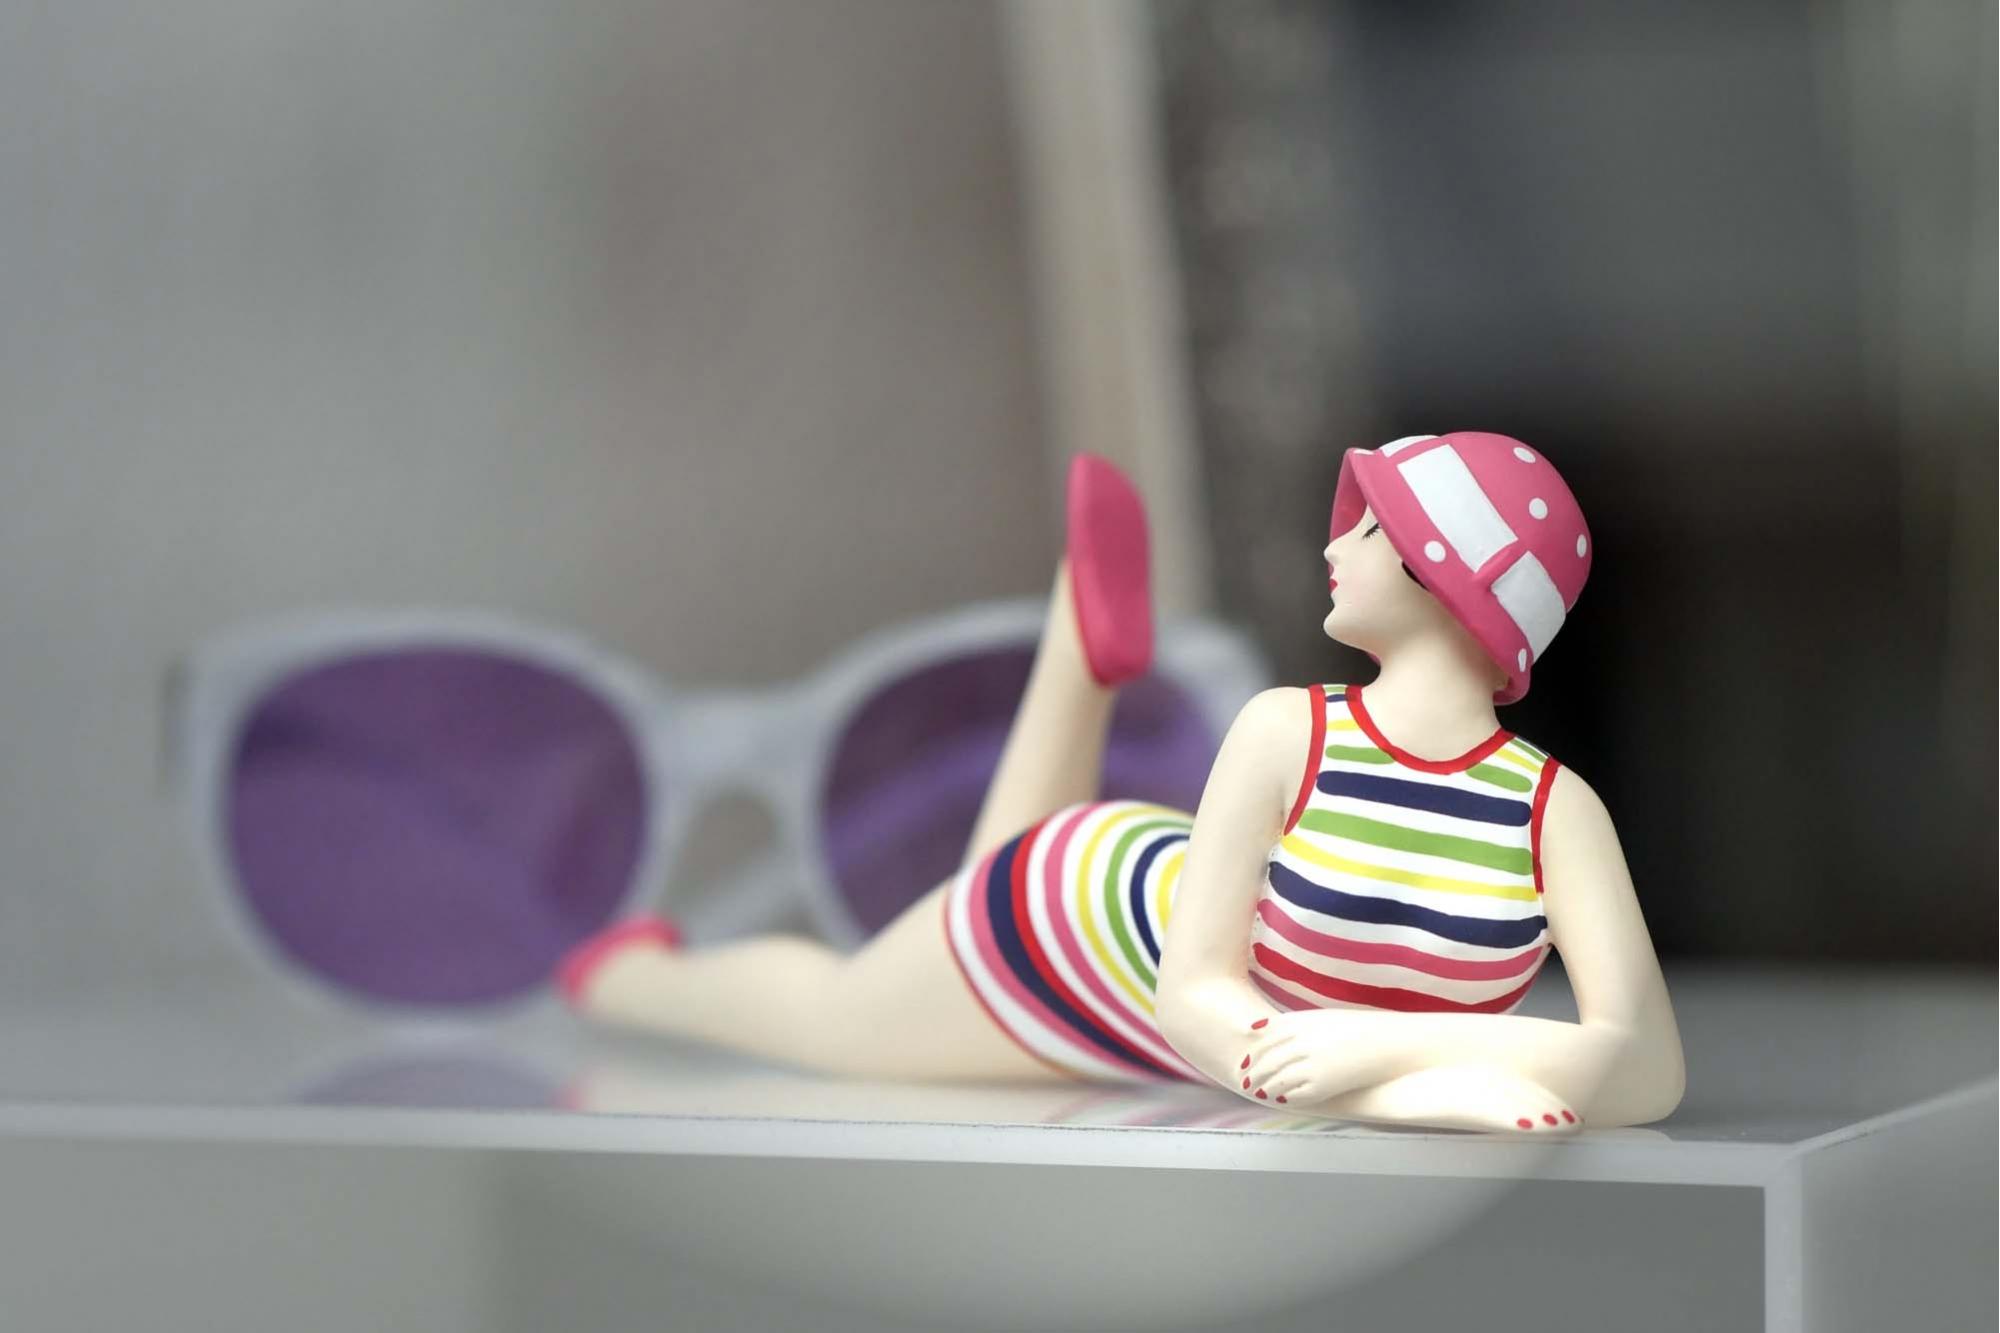 Schaufenster Nr. 009: Badenixen